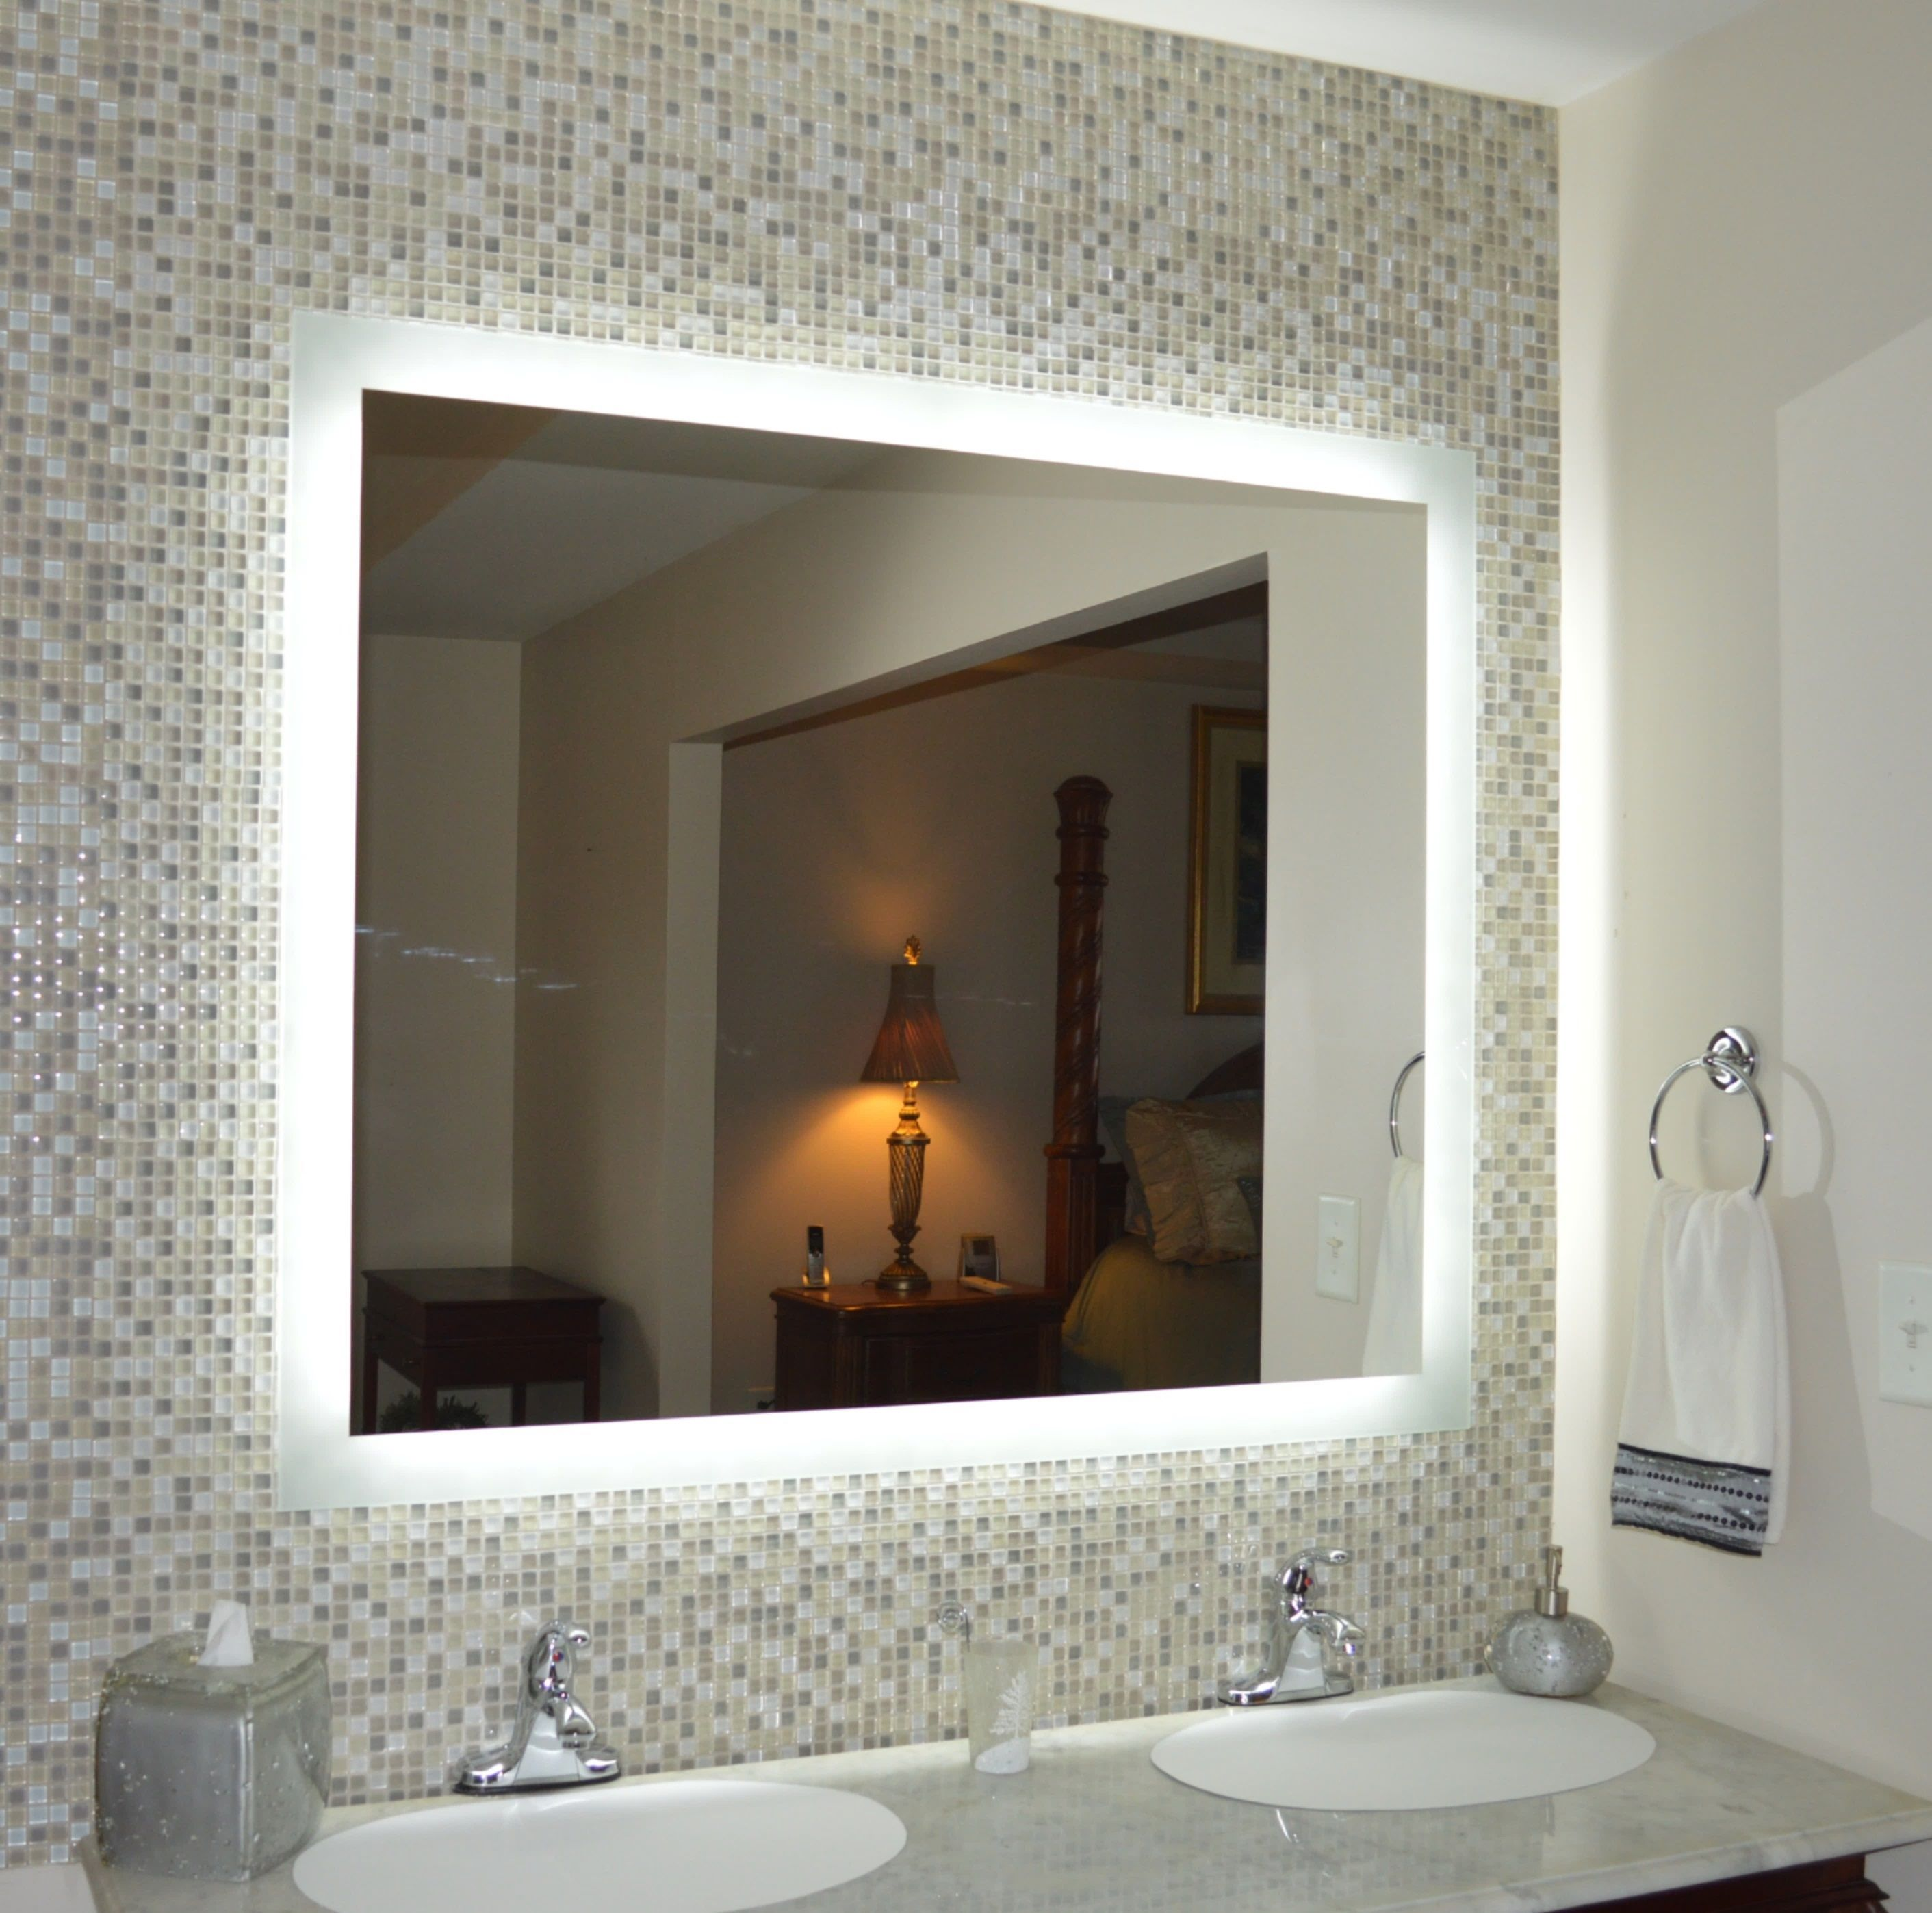 Side Lighted Led Bathroom Vanity Mirror 48 Wide X 40 Tall